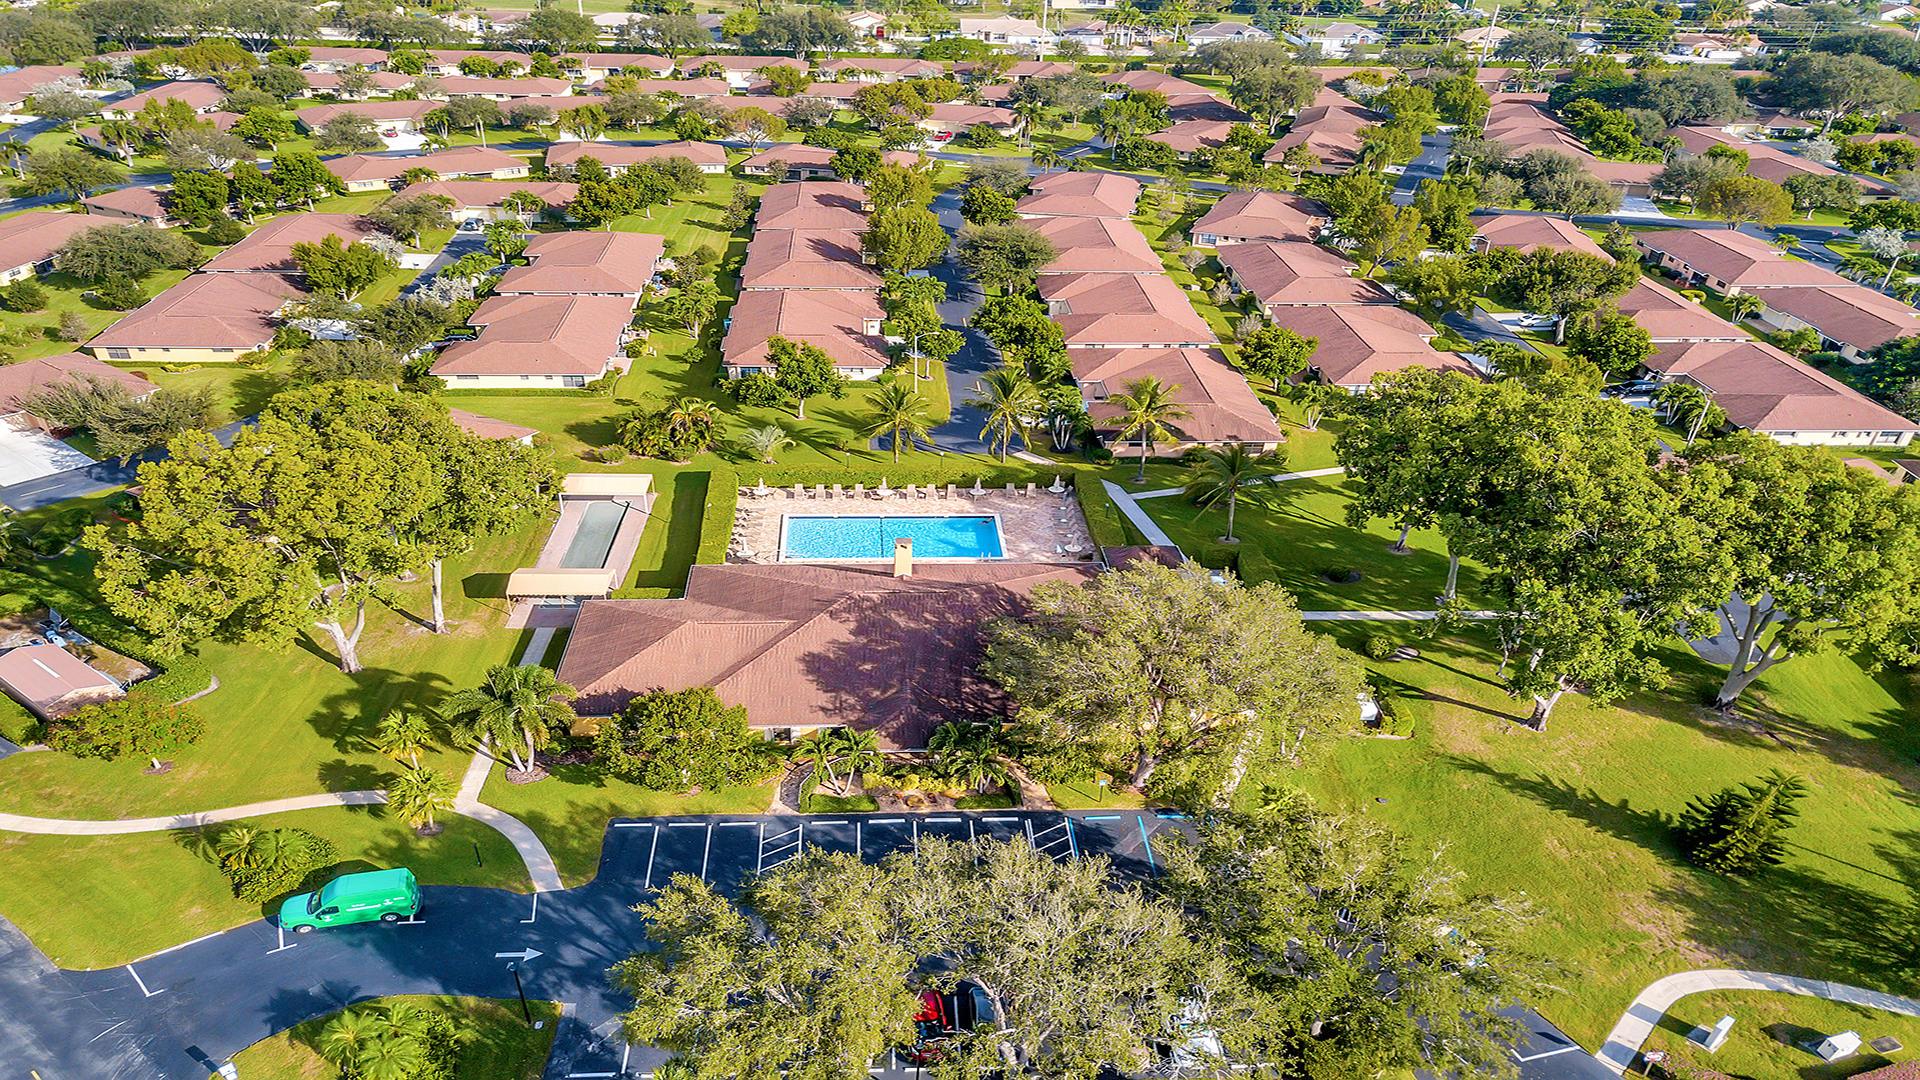 9935 Papaya Tree Trail, Boynton Beach, FL 33436